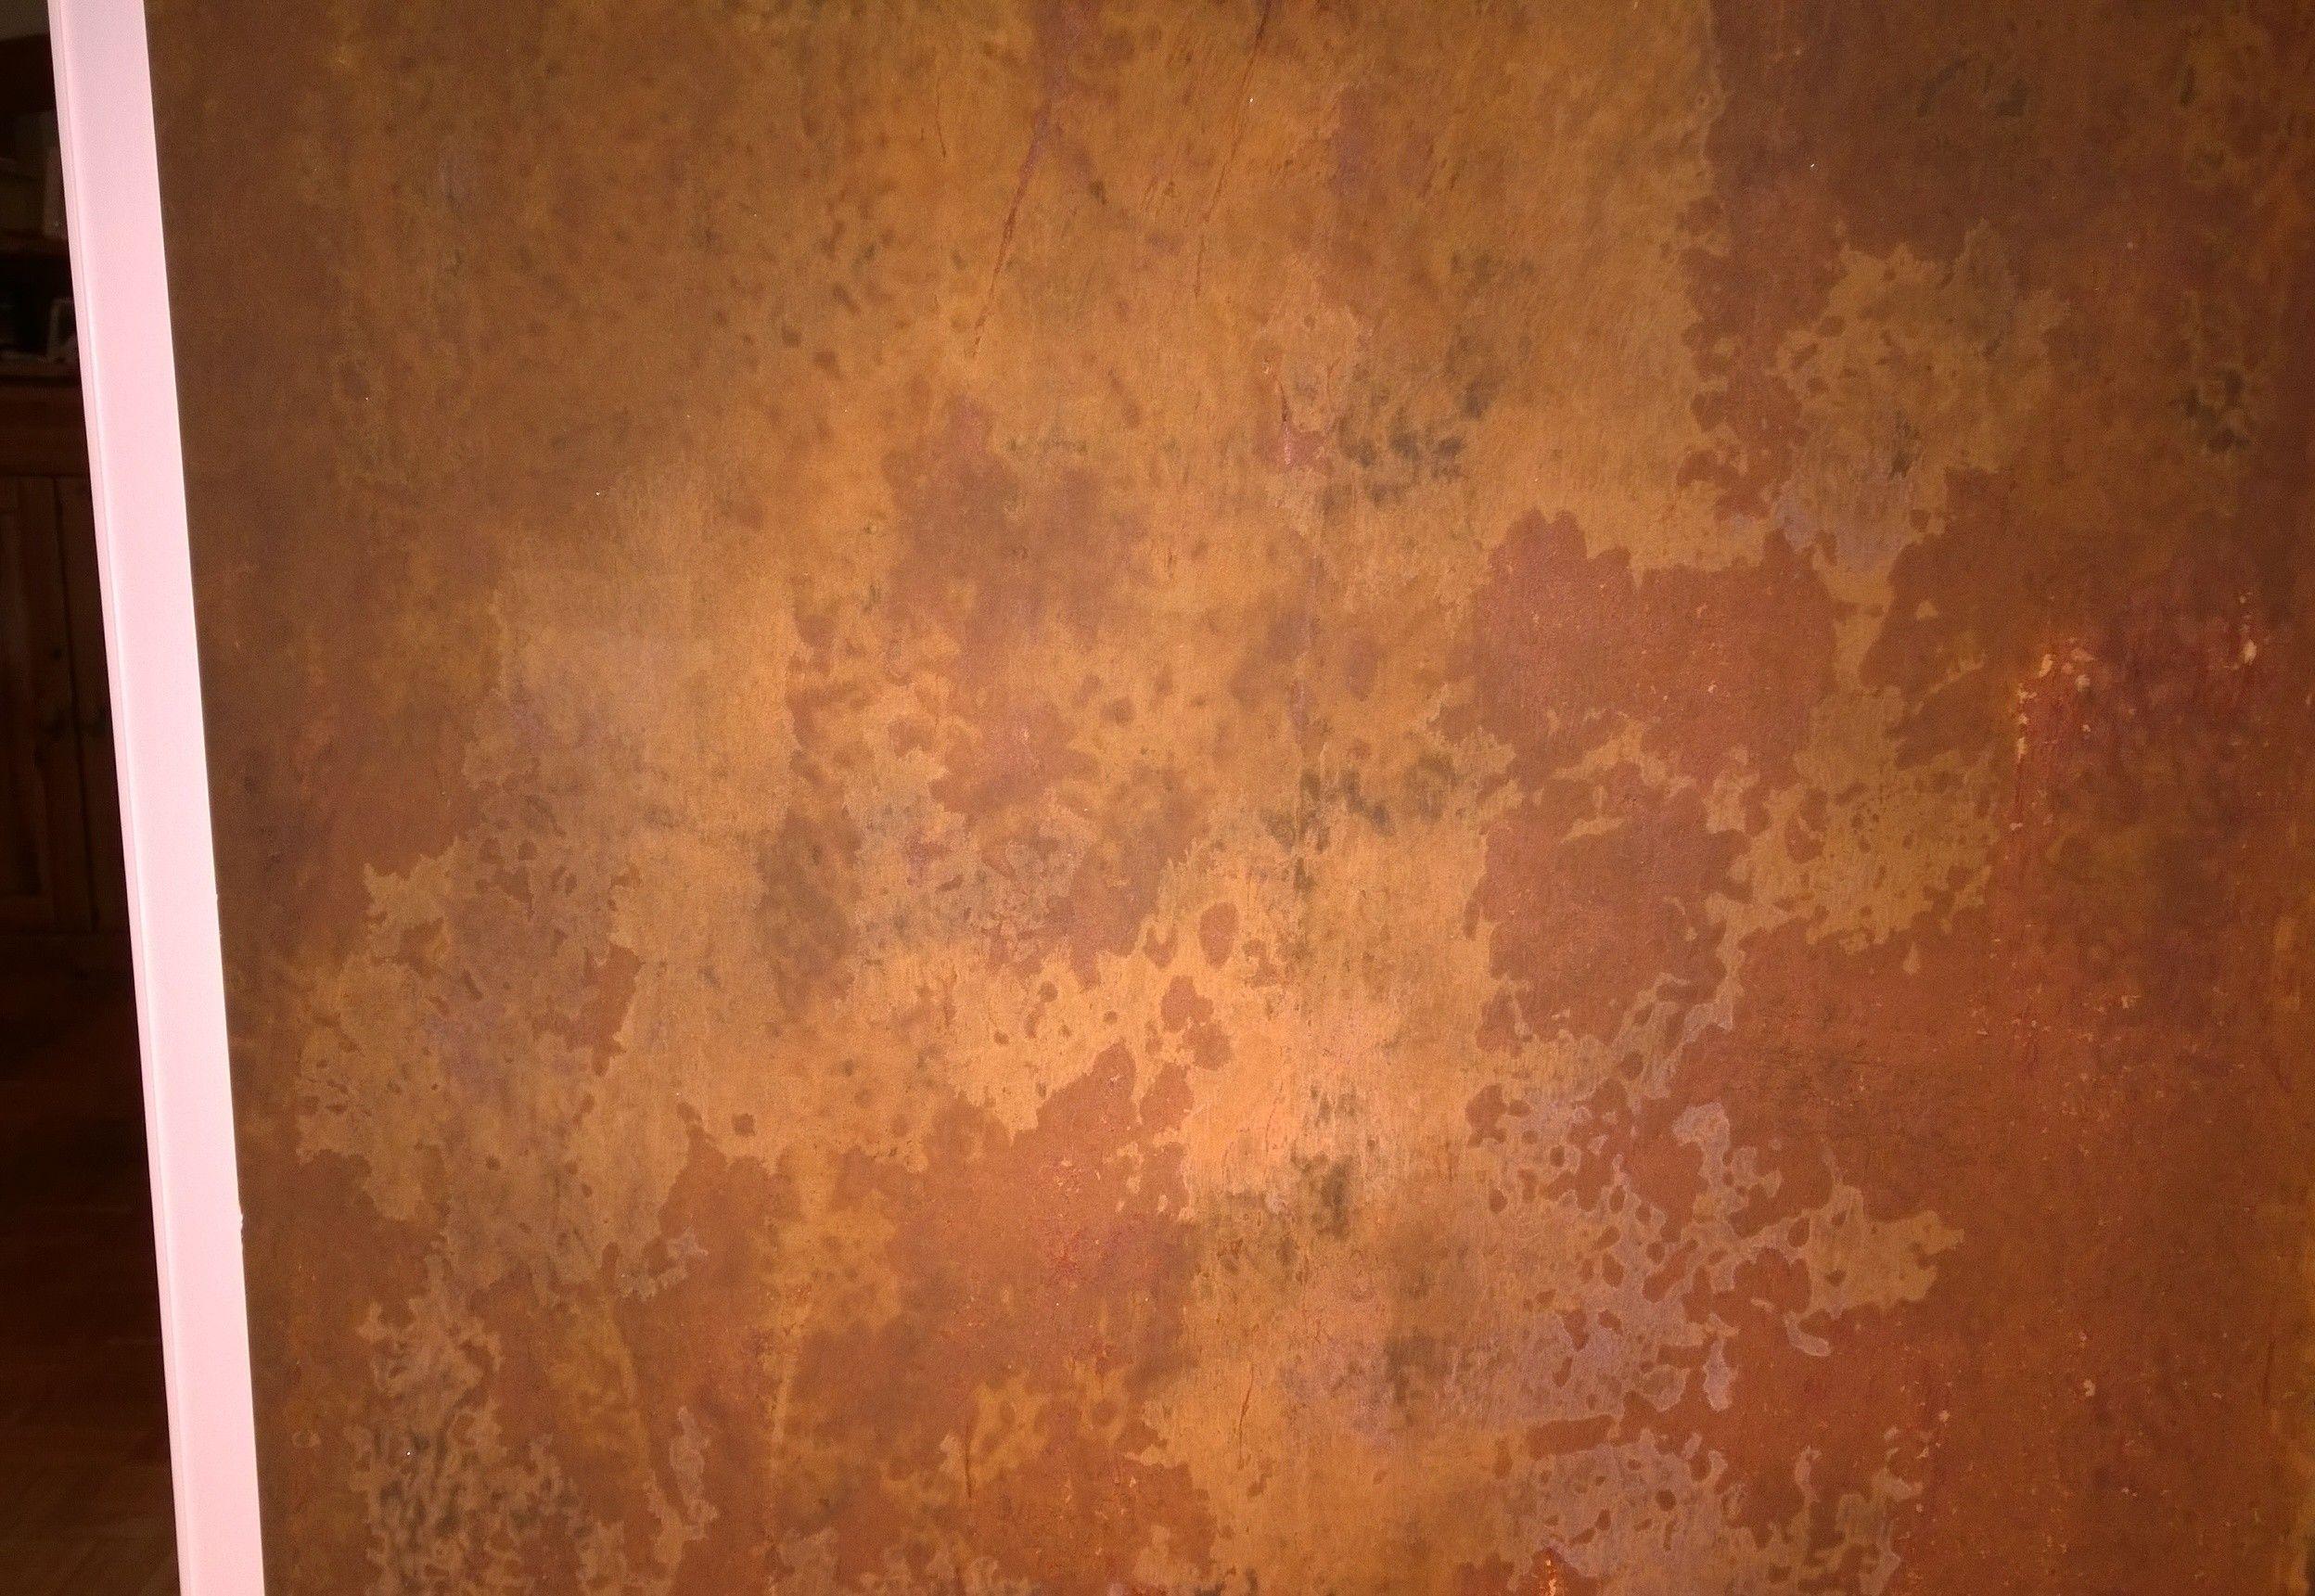 rostoptik von frankjordan metall rost rust painting rostoptik pinterest metall optik. Black Bedroom Furniture Sets. Home Design Ideas